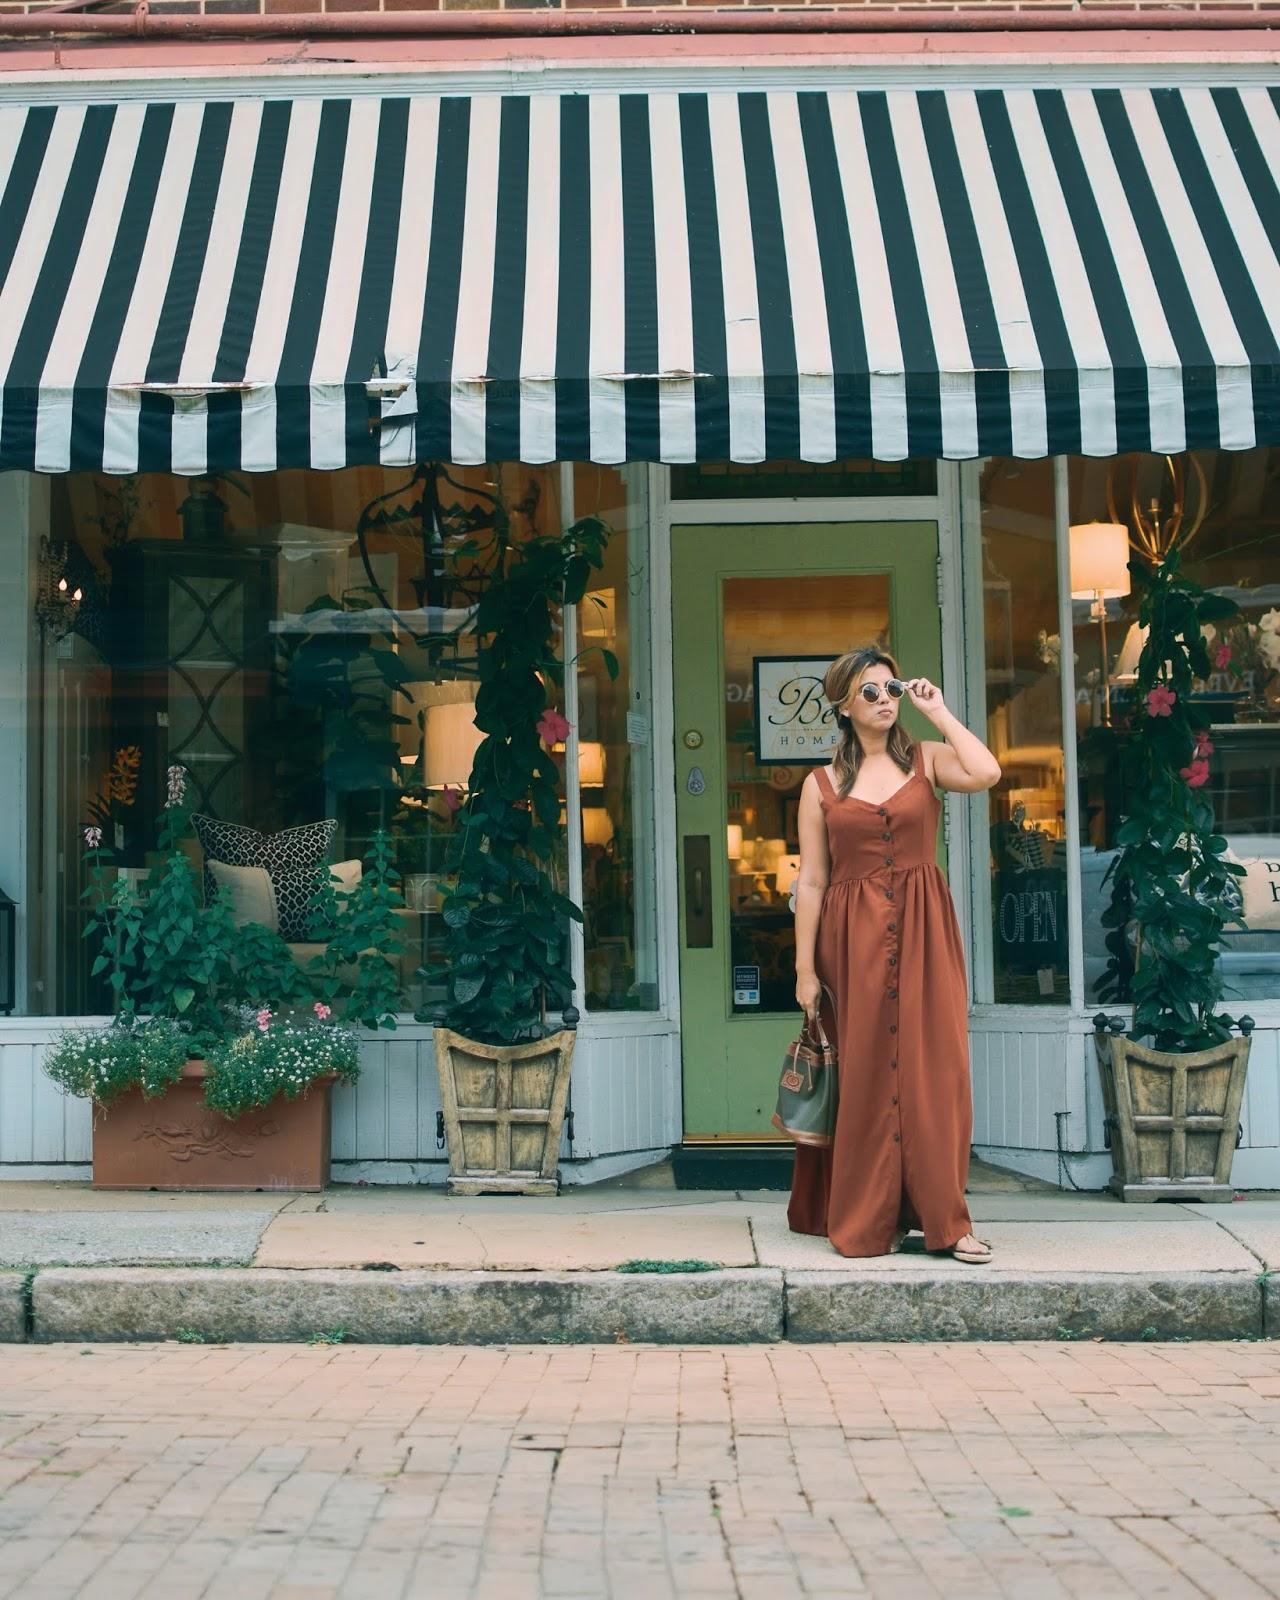 El vestido perfecto-fashion fall trends 2018-otoño style-shein-streetstyle-vestidos largos-maxi dress-dcblogger-marisolflamenco-armandhugon-moda el salvador-latina blogger-